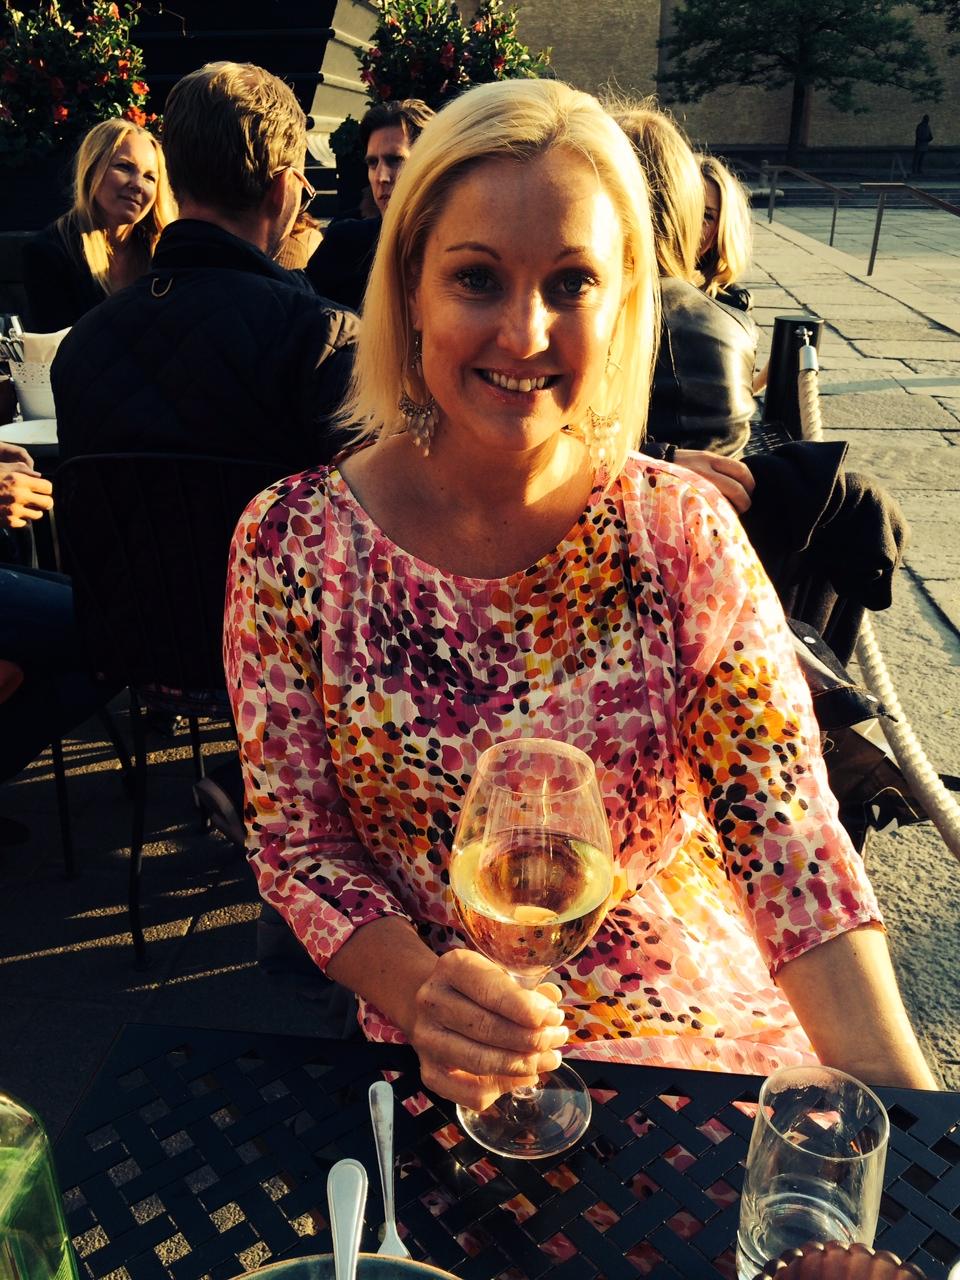 kreditkort fusk blond i Göteborg